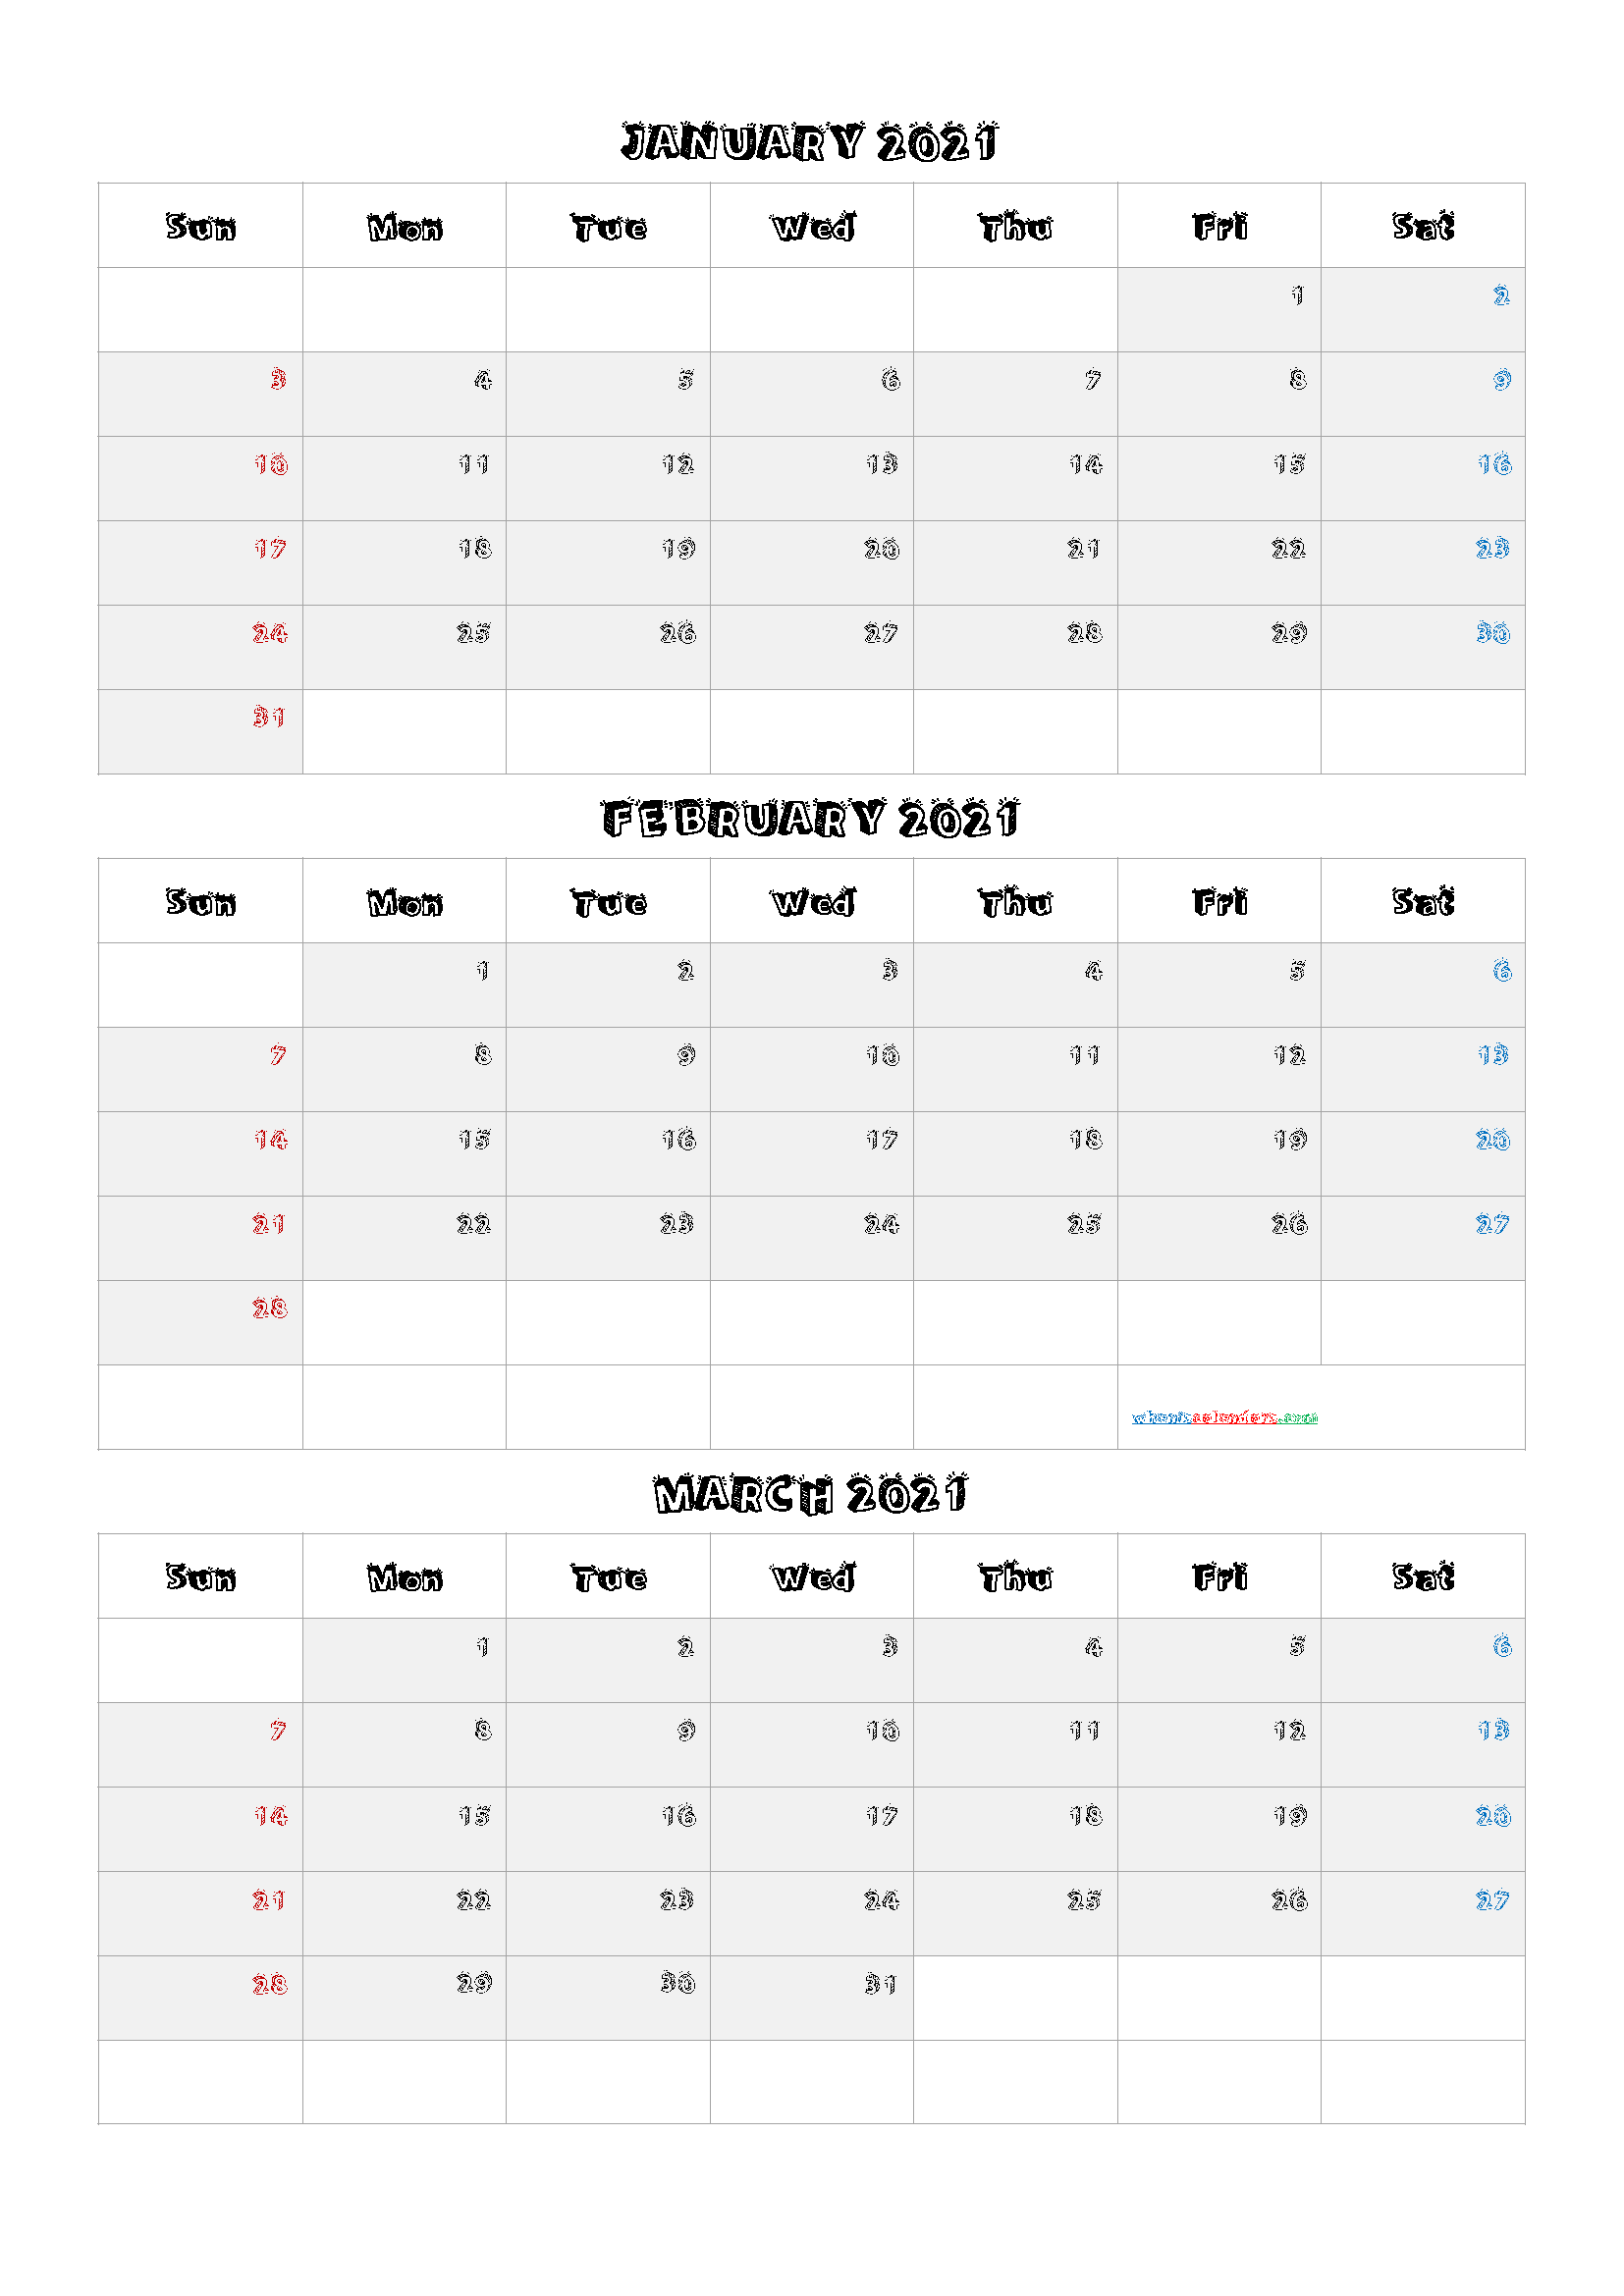 Free January February March 2021 Calendar